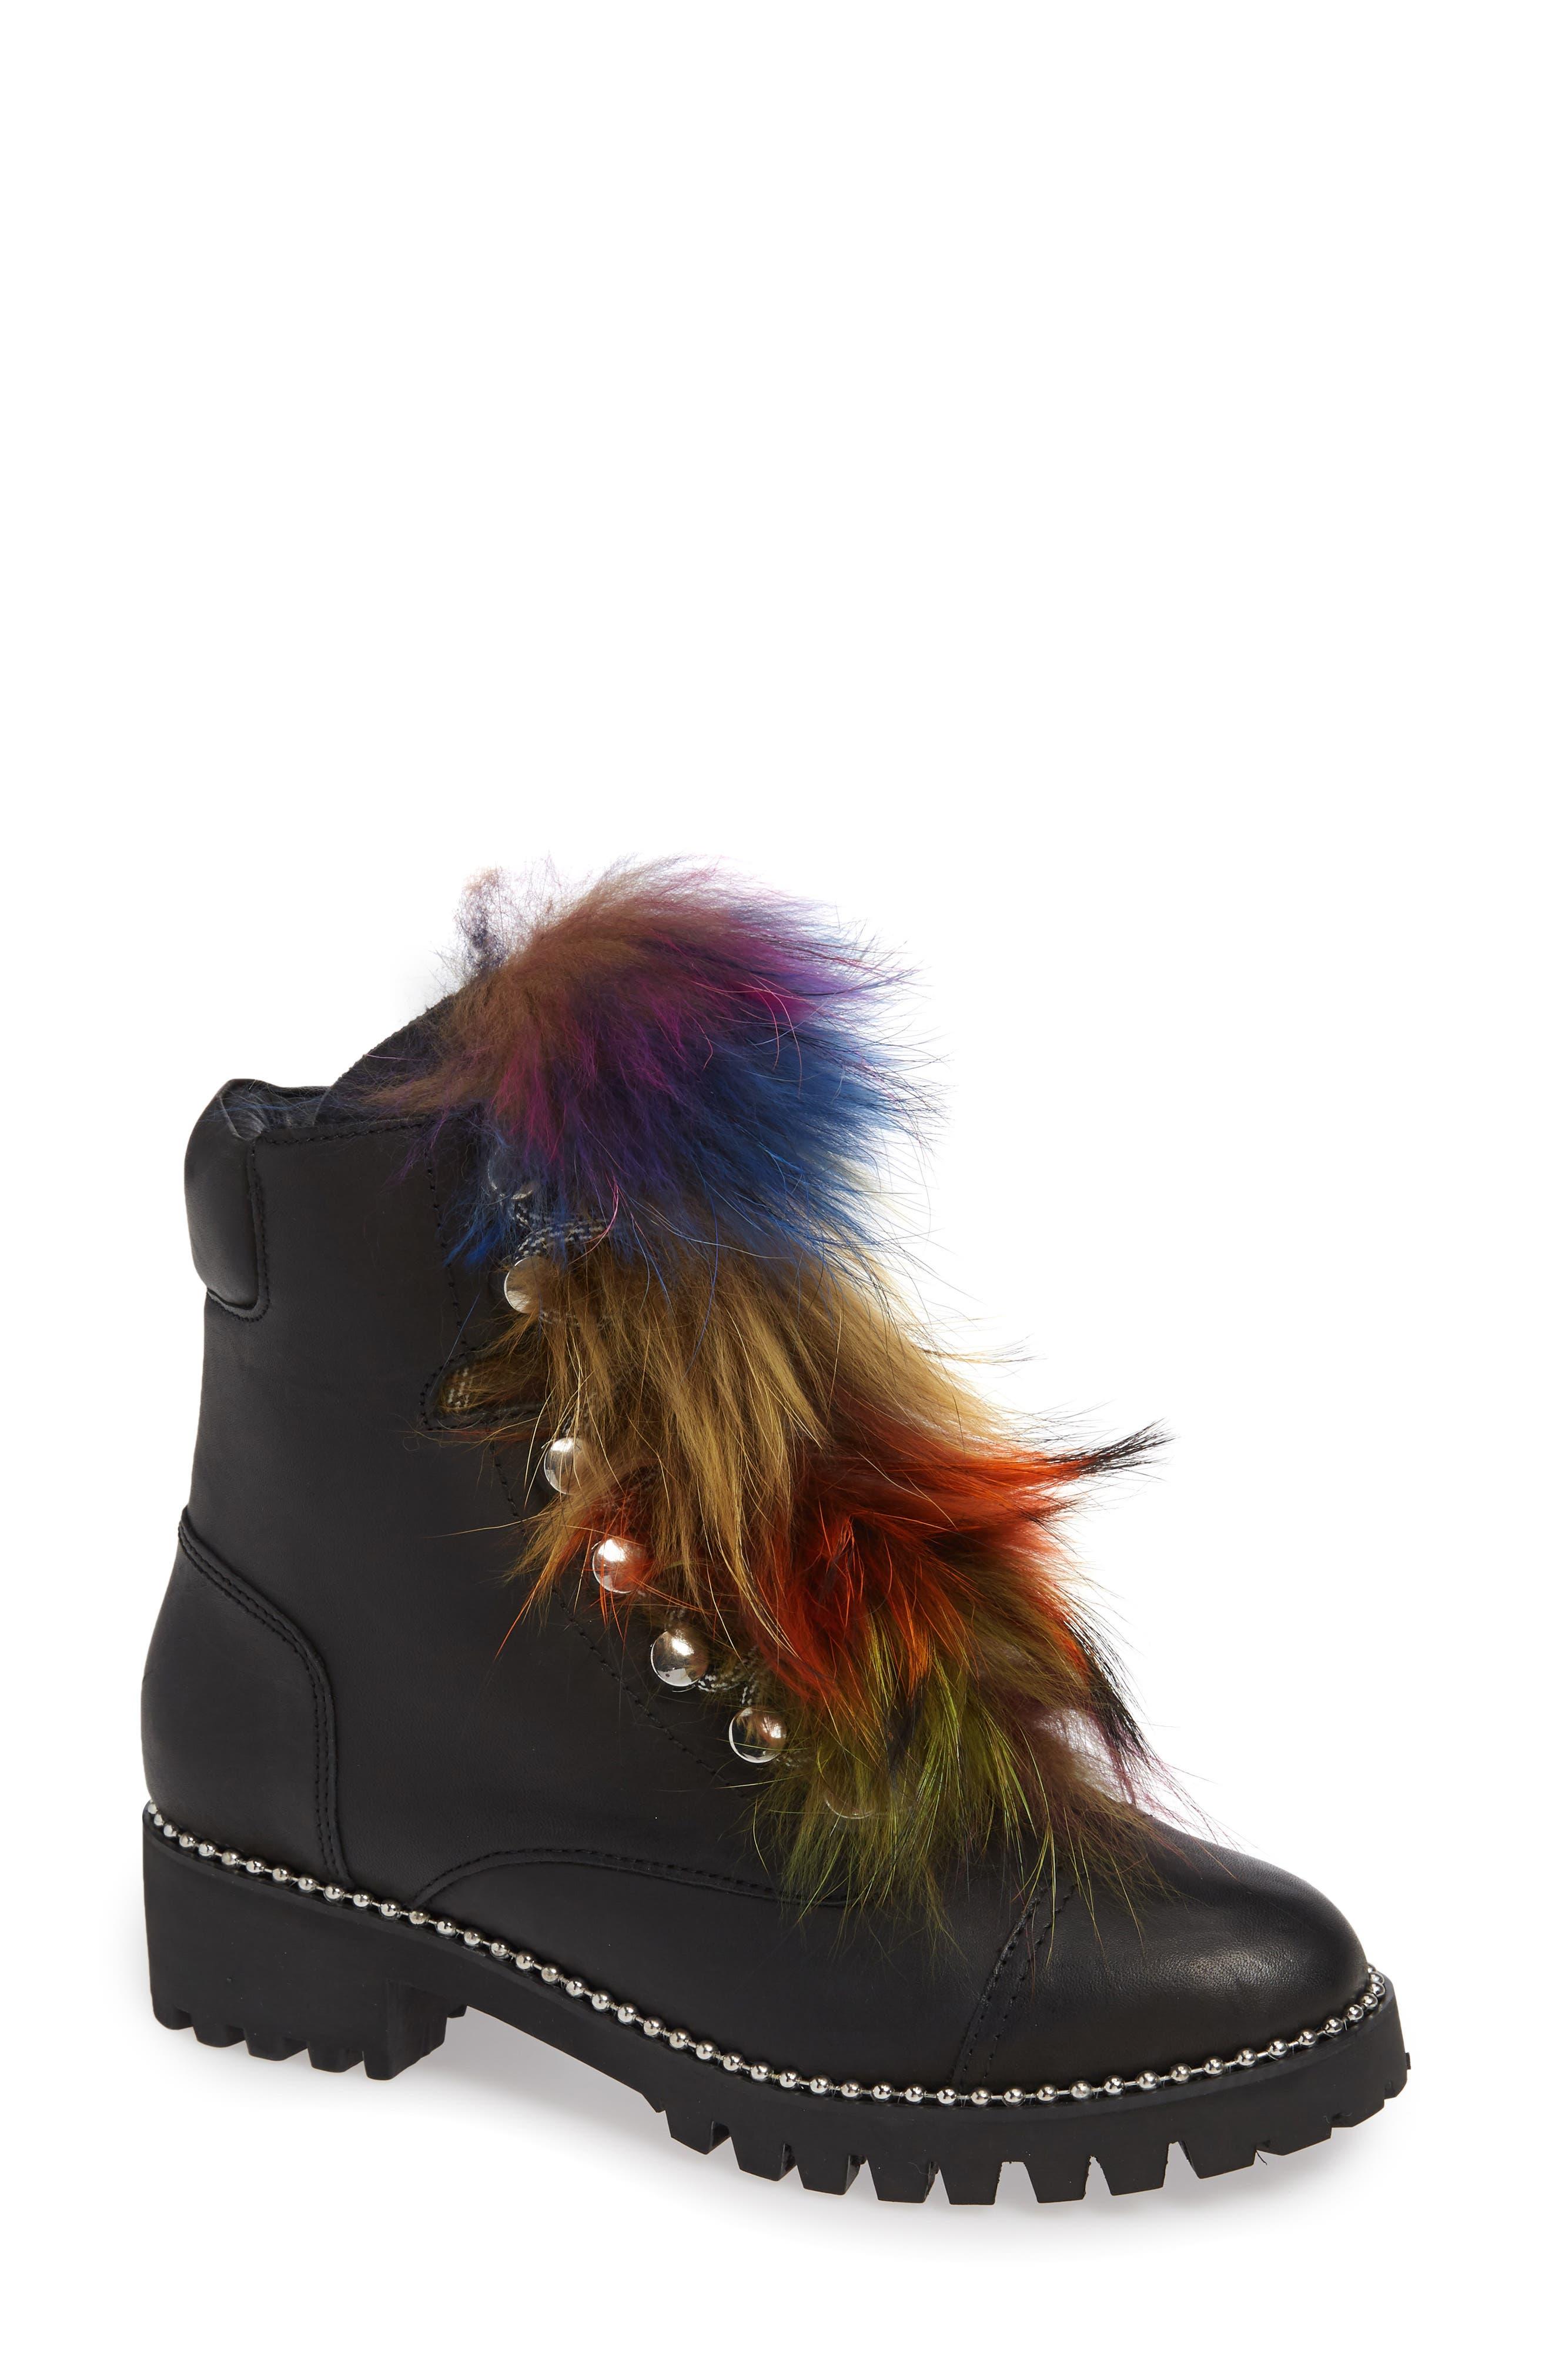 Trekker Boot With Genuine Fox Fur Trim